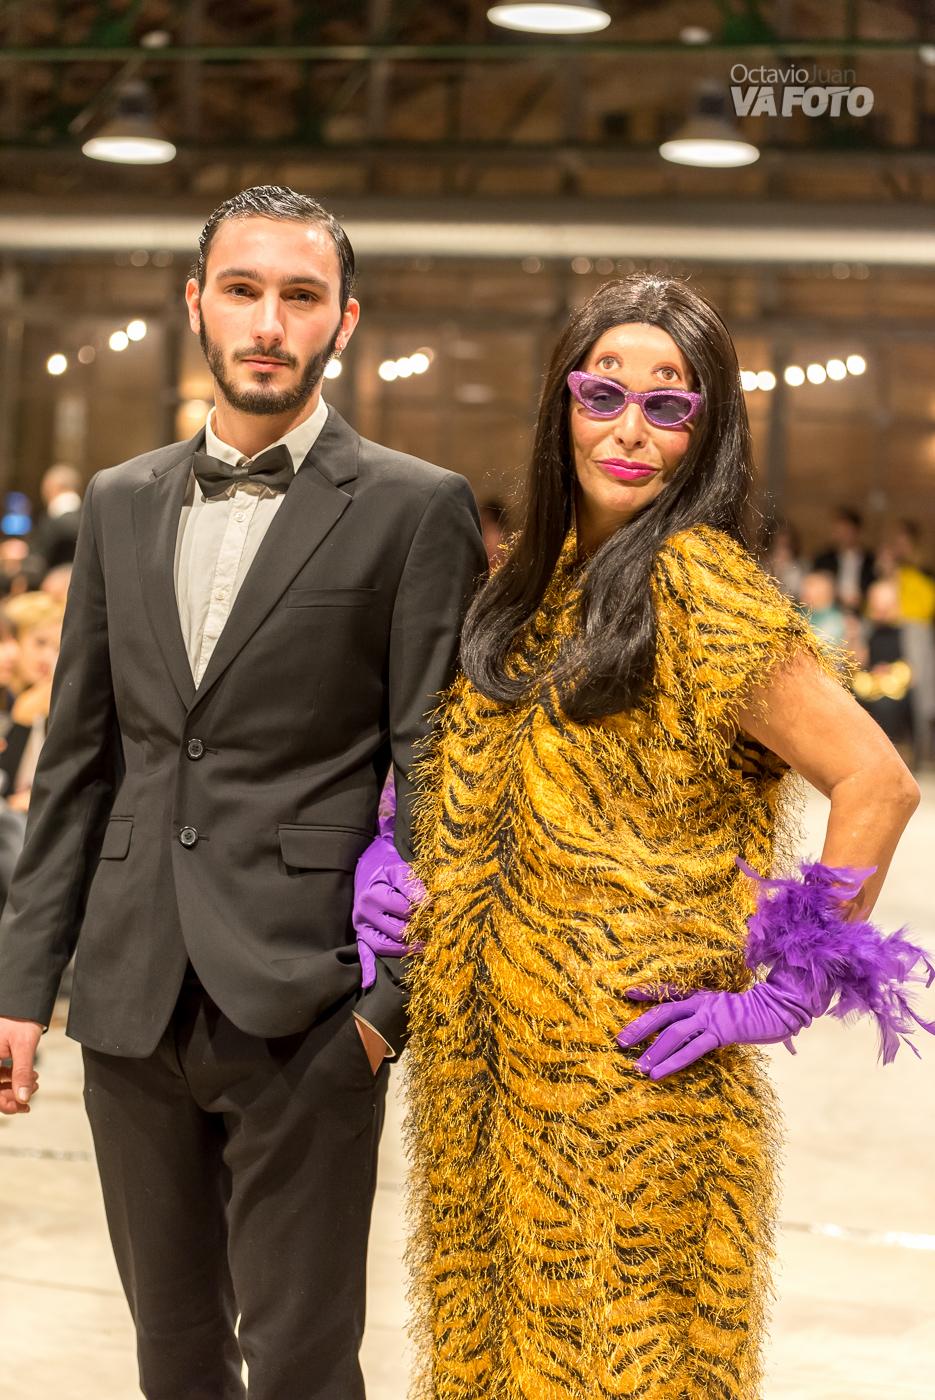 00169 ARTEMODA DSC4268 20181124 - Evento: Arte + Moda Valencia